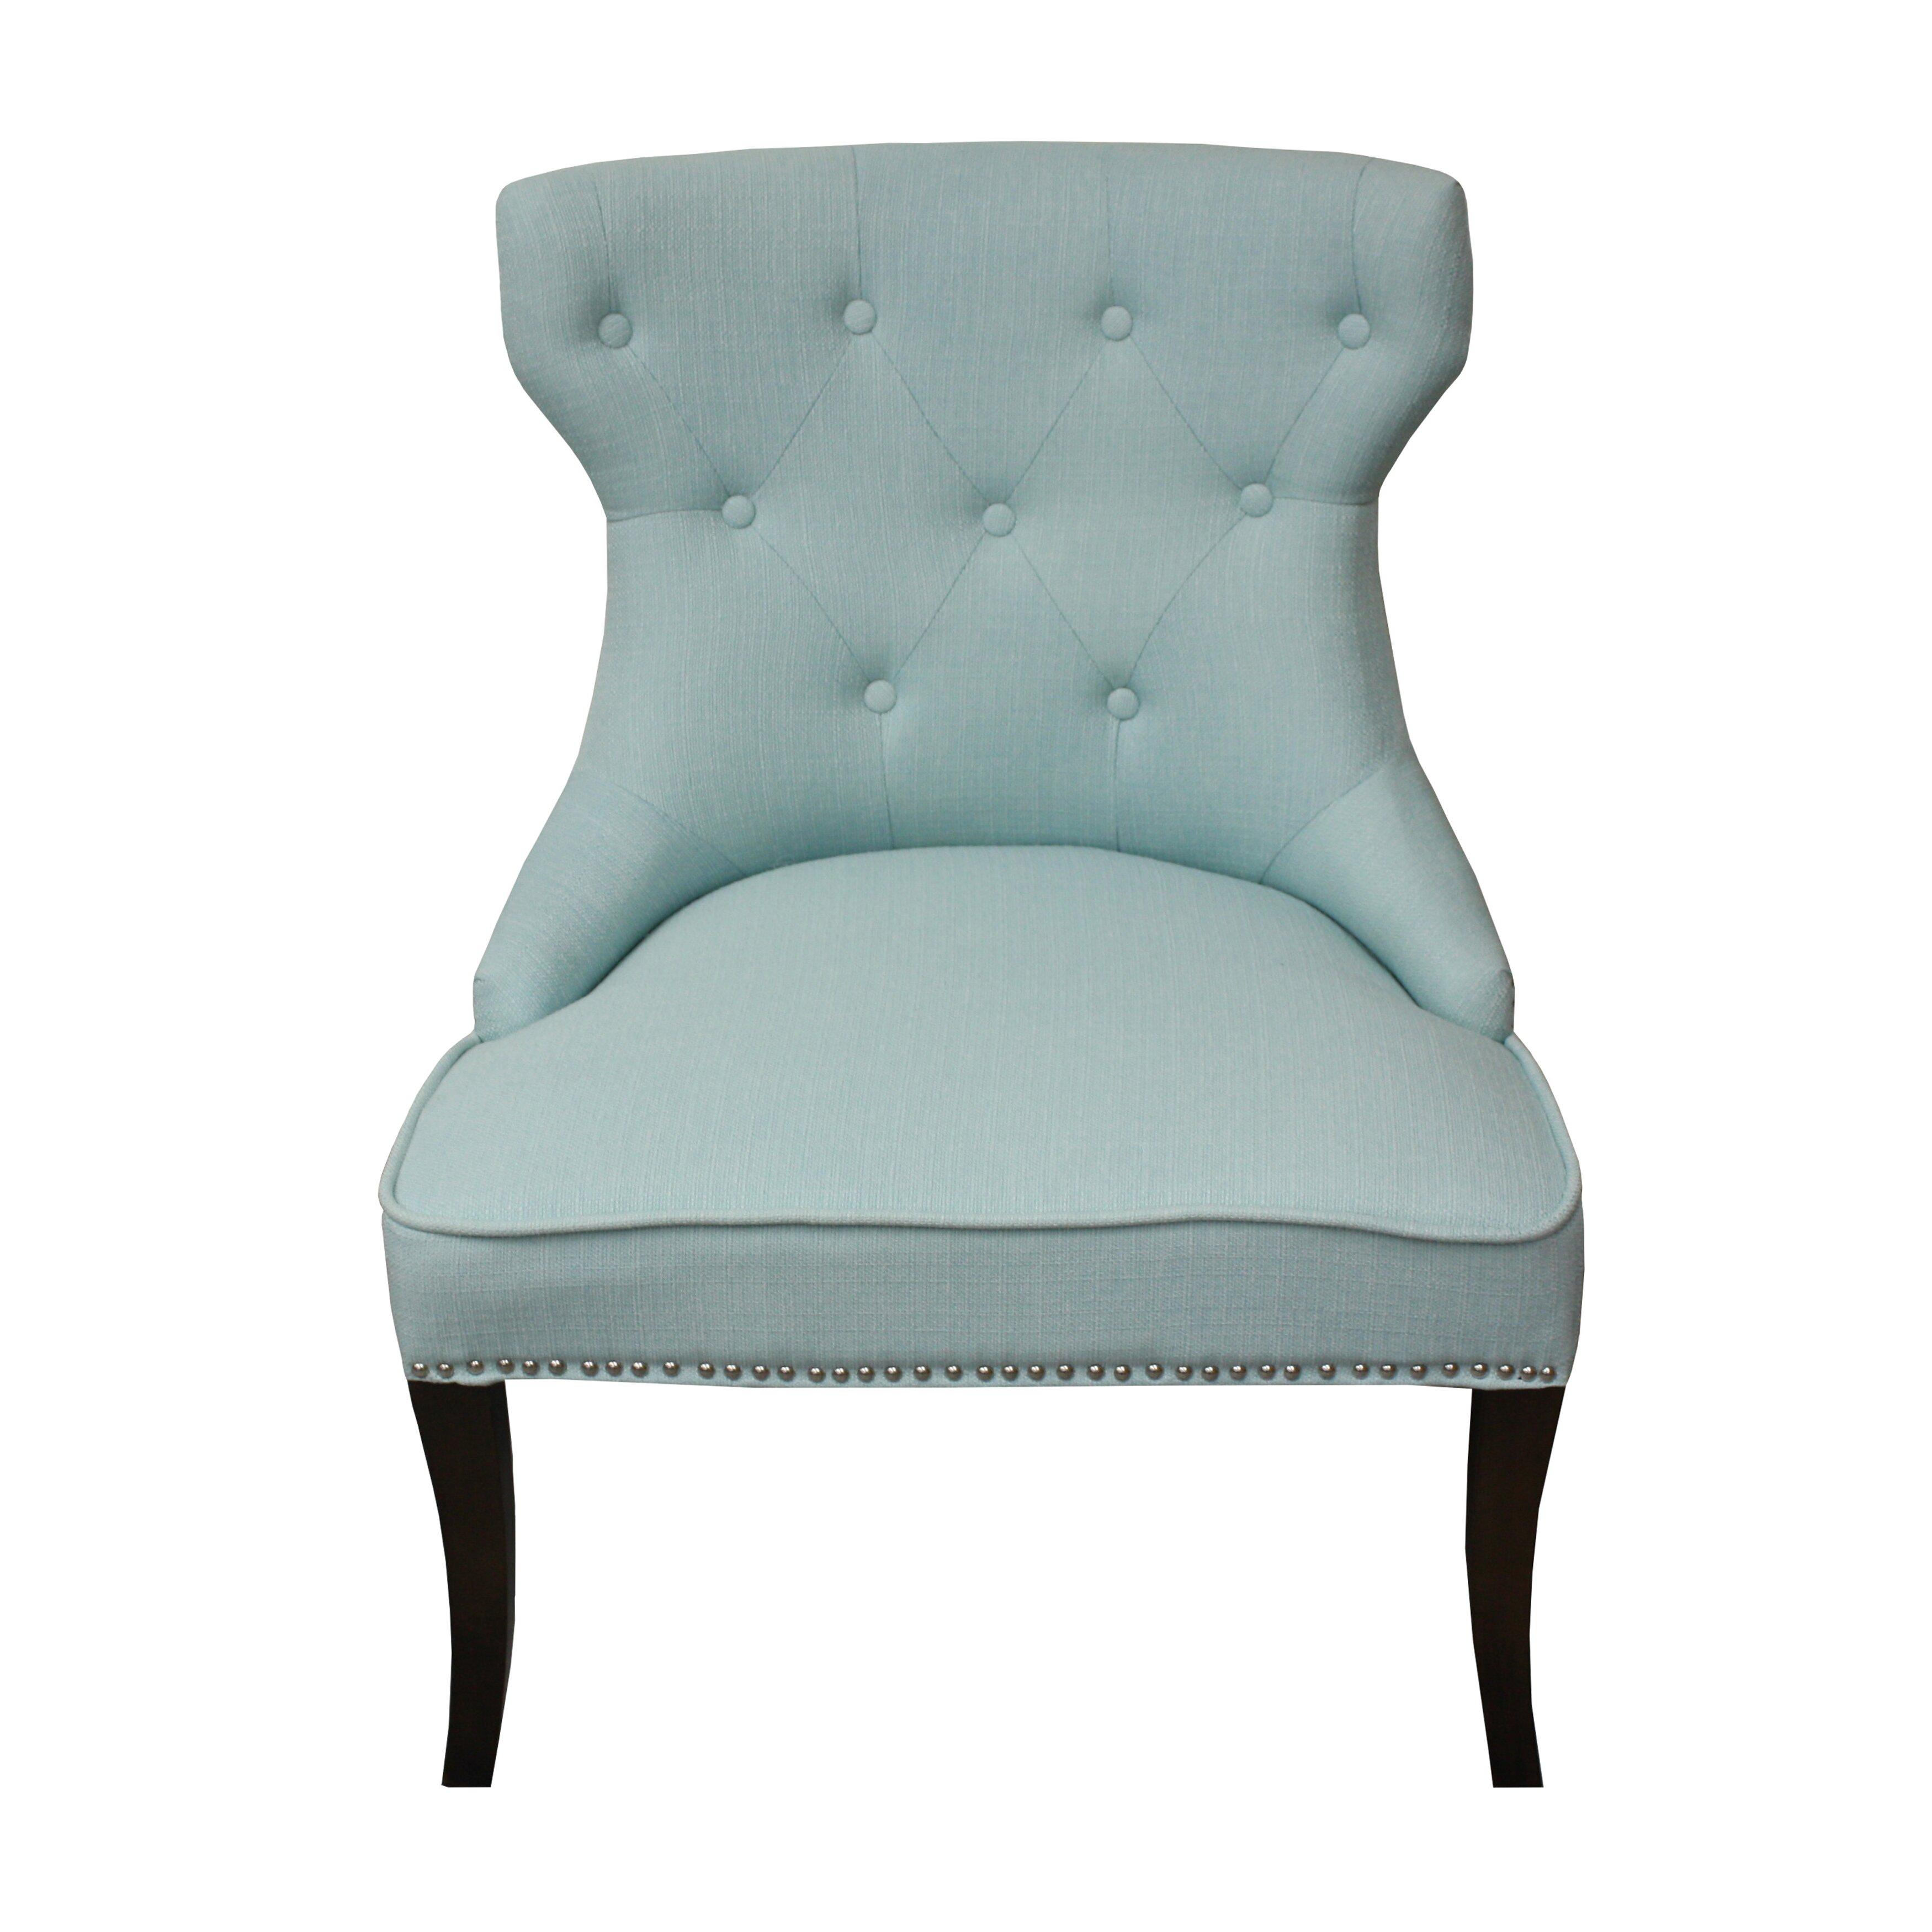 Hd Couture Furniture valentineblog